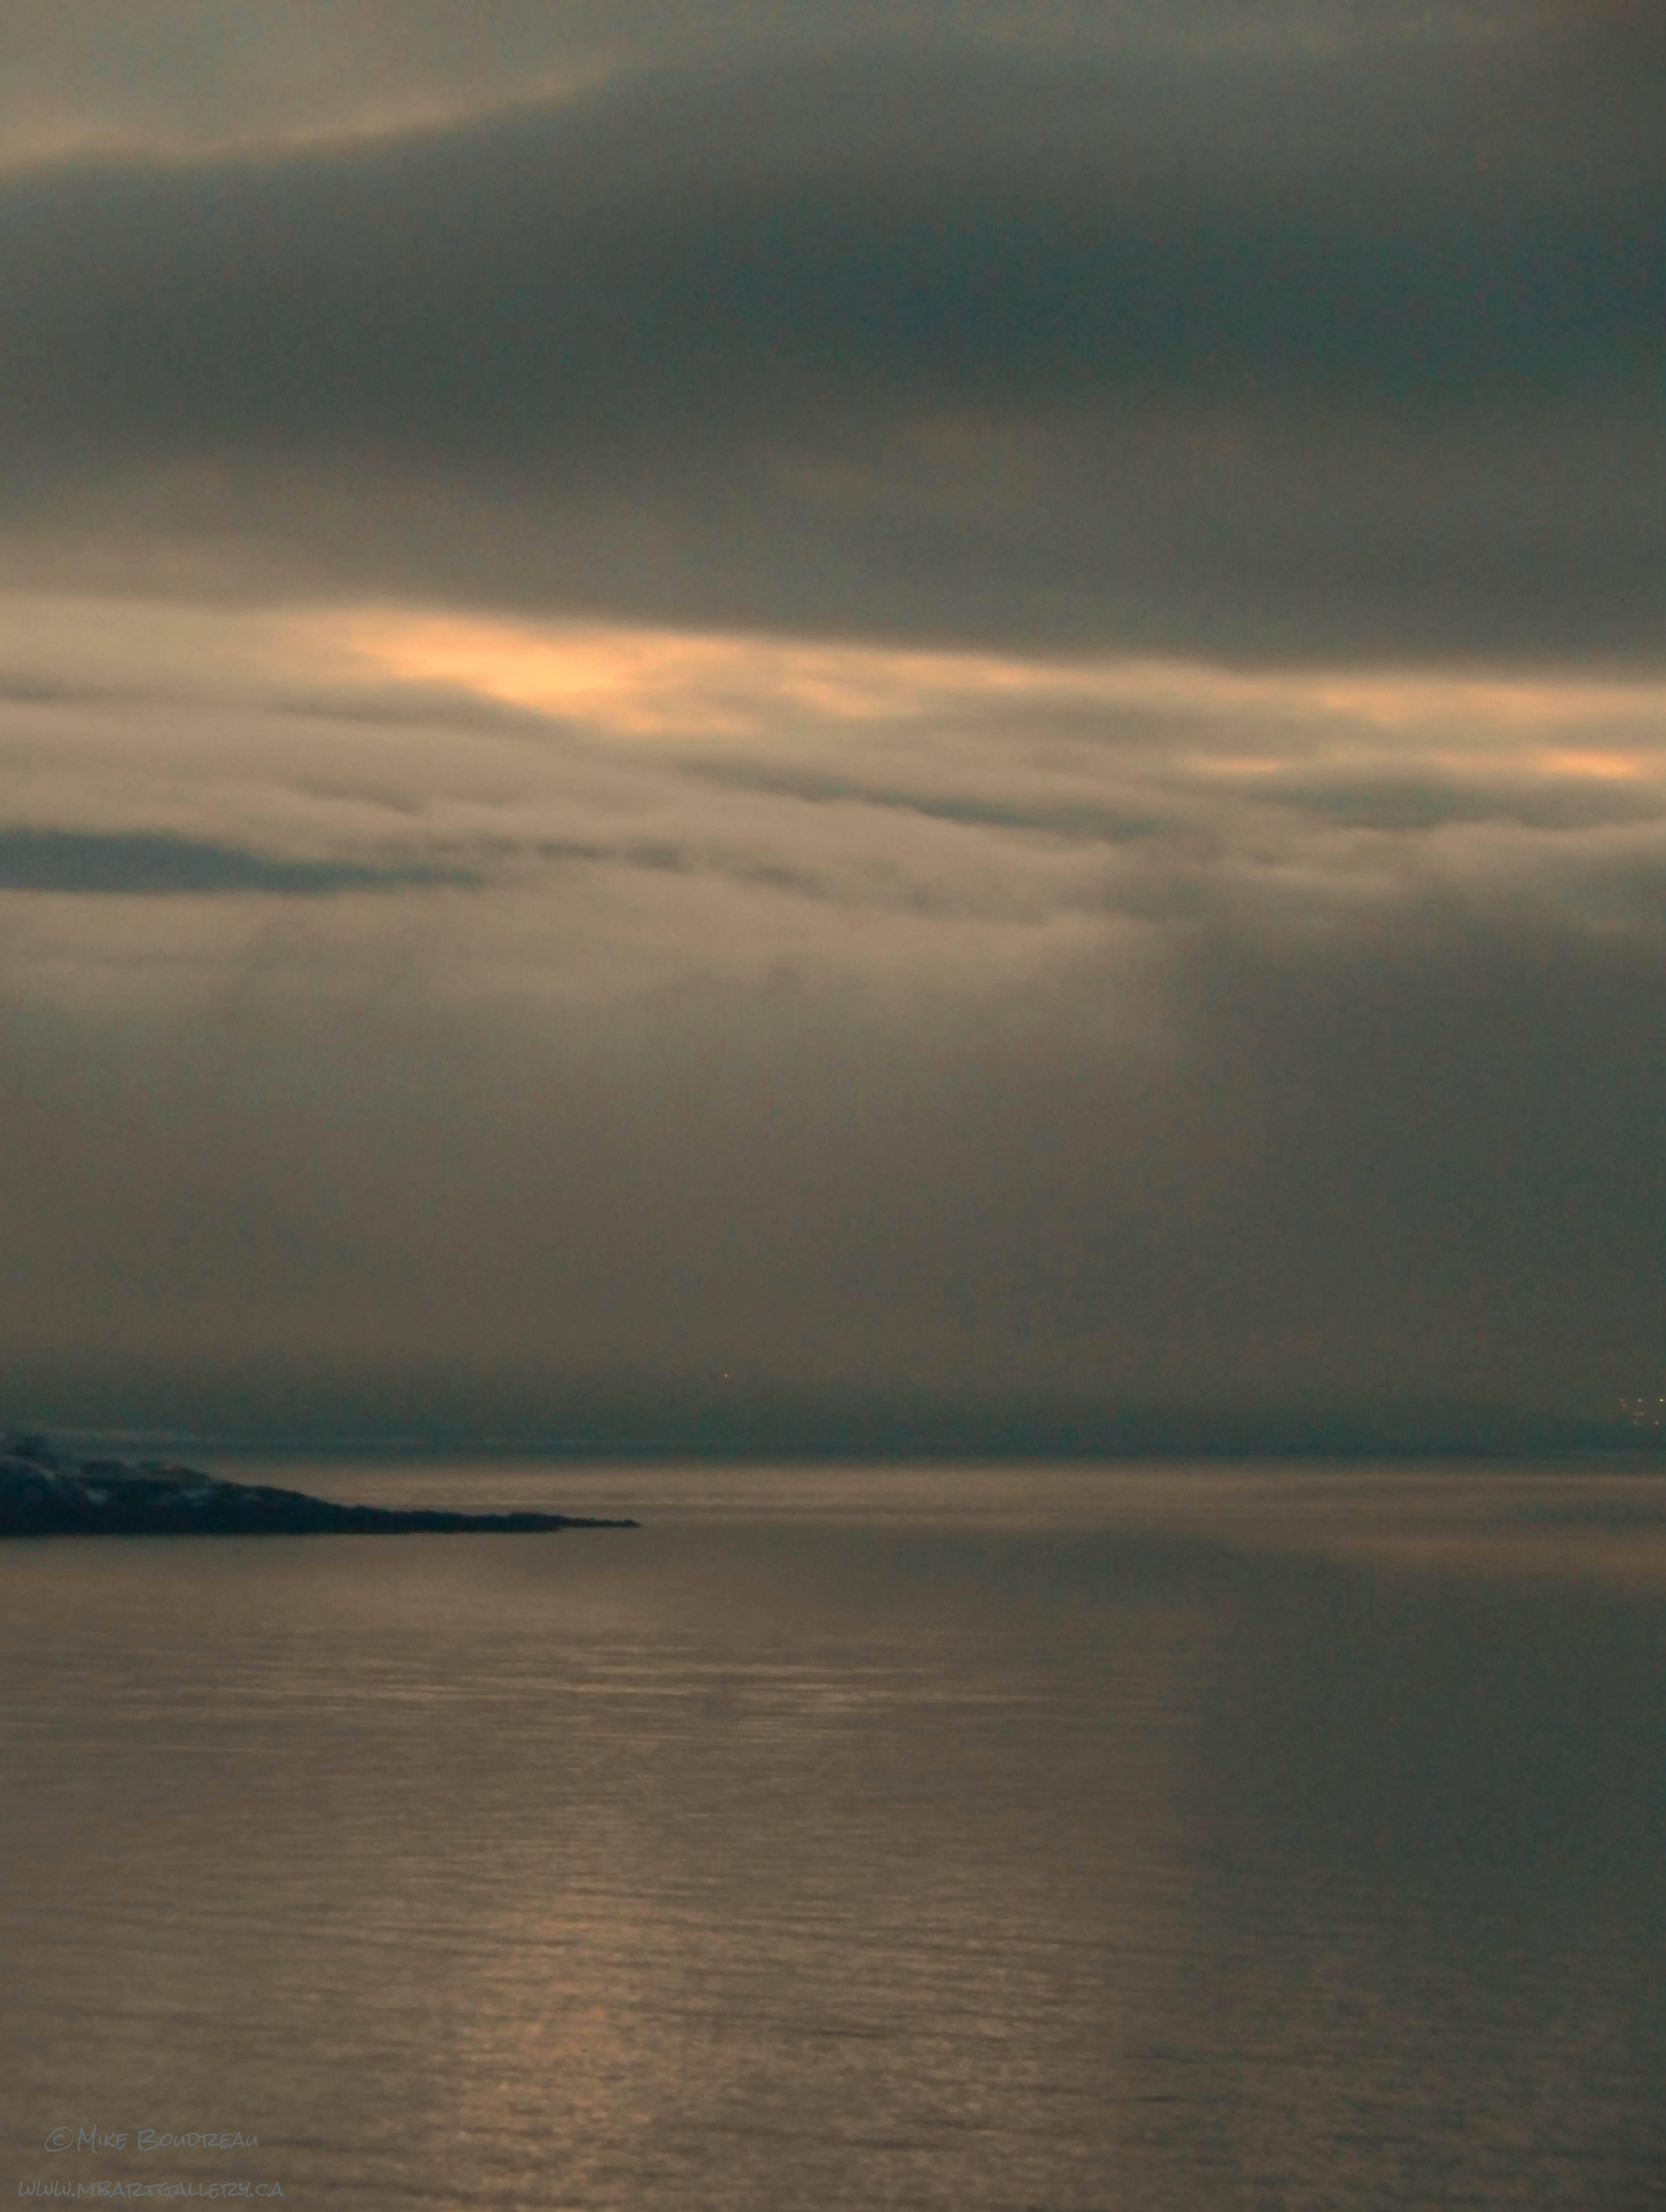 Bay Of Fundy Edge of Partridge Island, Saint Johh NB